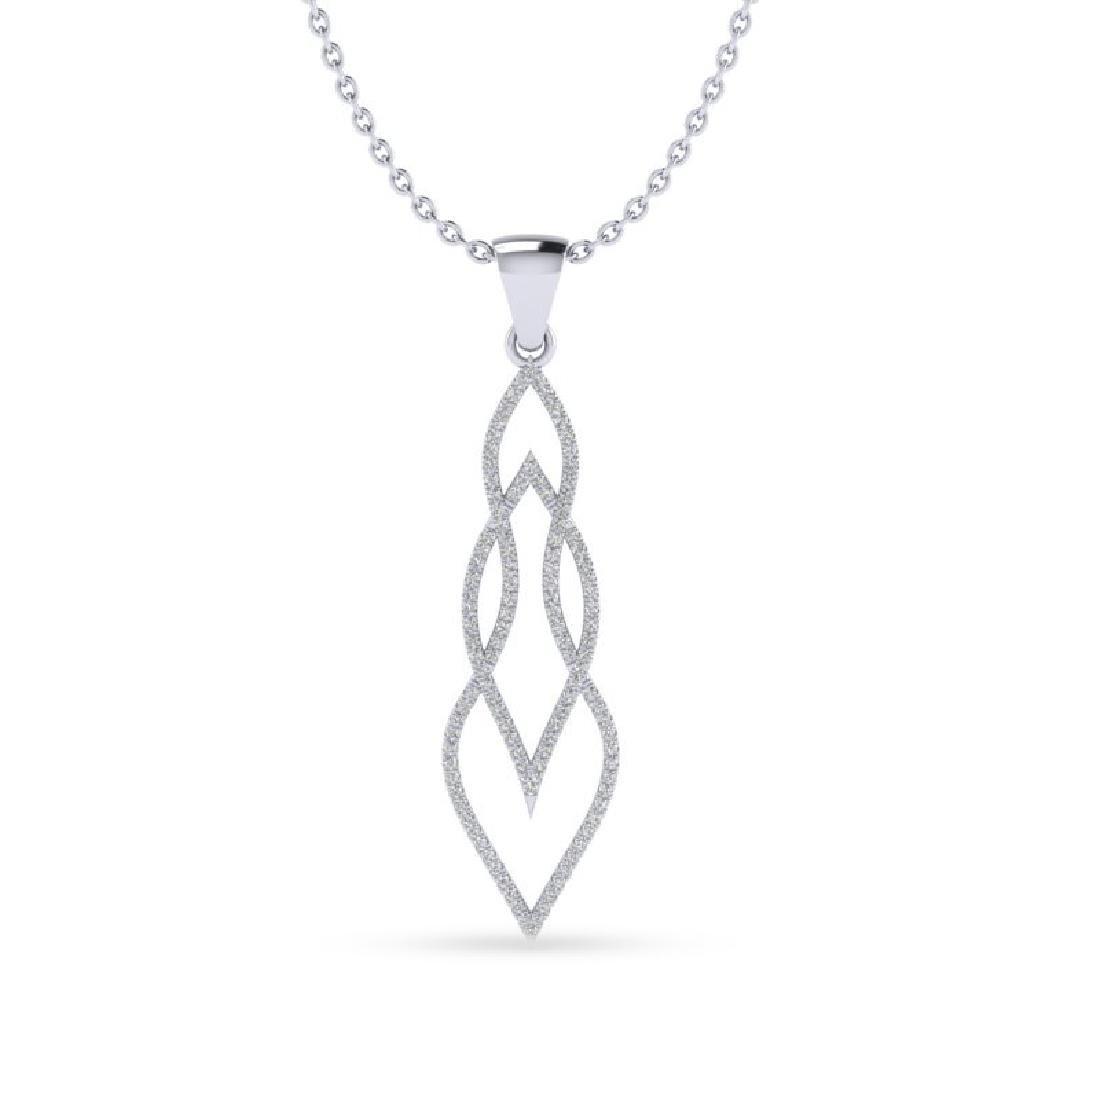 0.80 CTW Micro Pave VS/SI Diamond Necklace 14K White